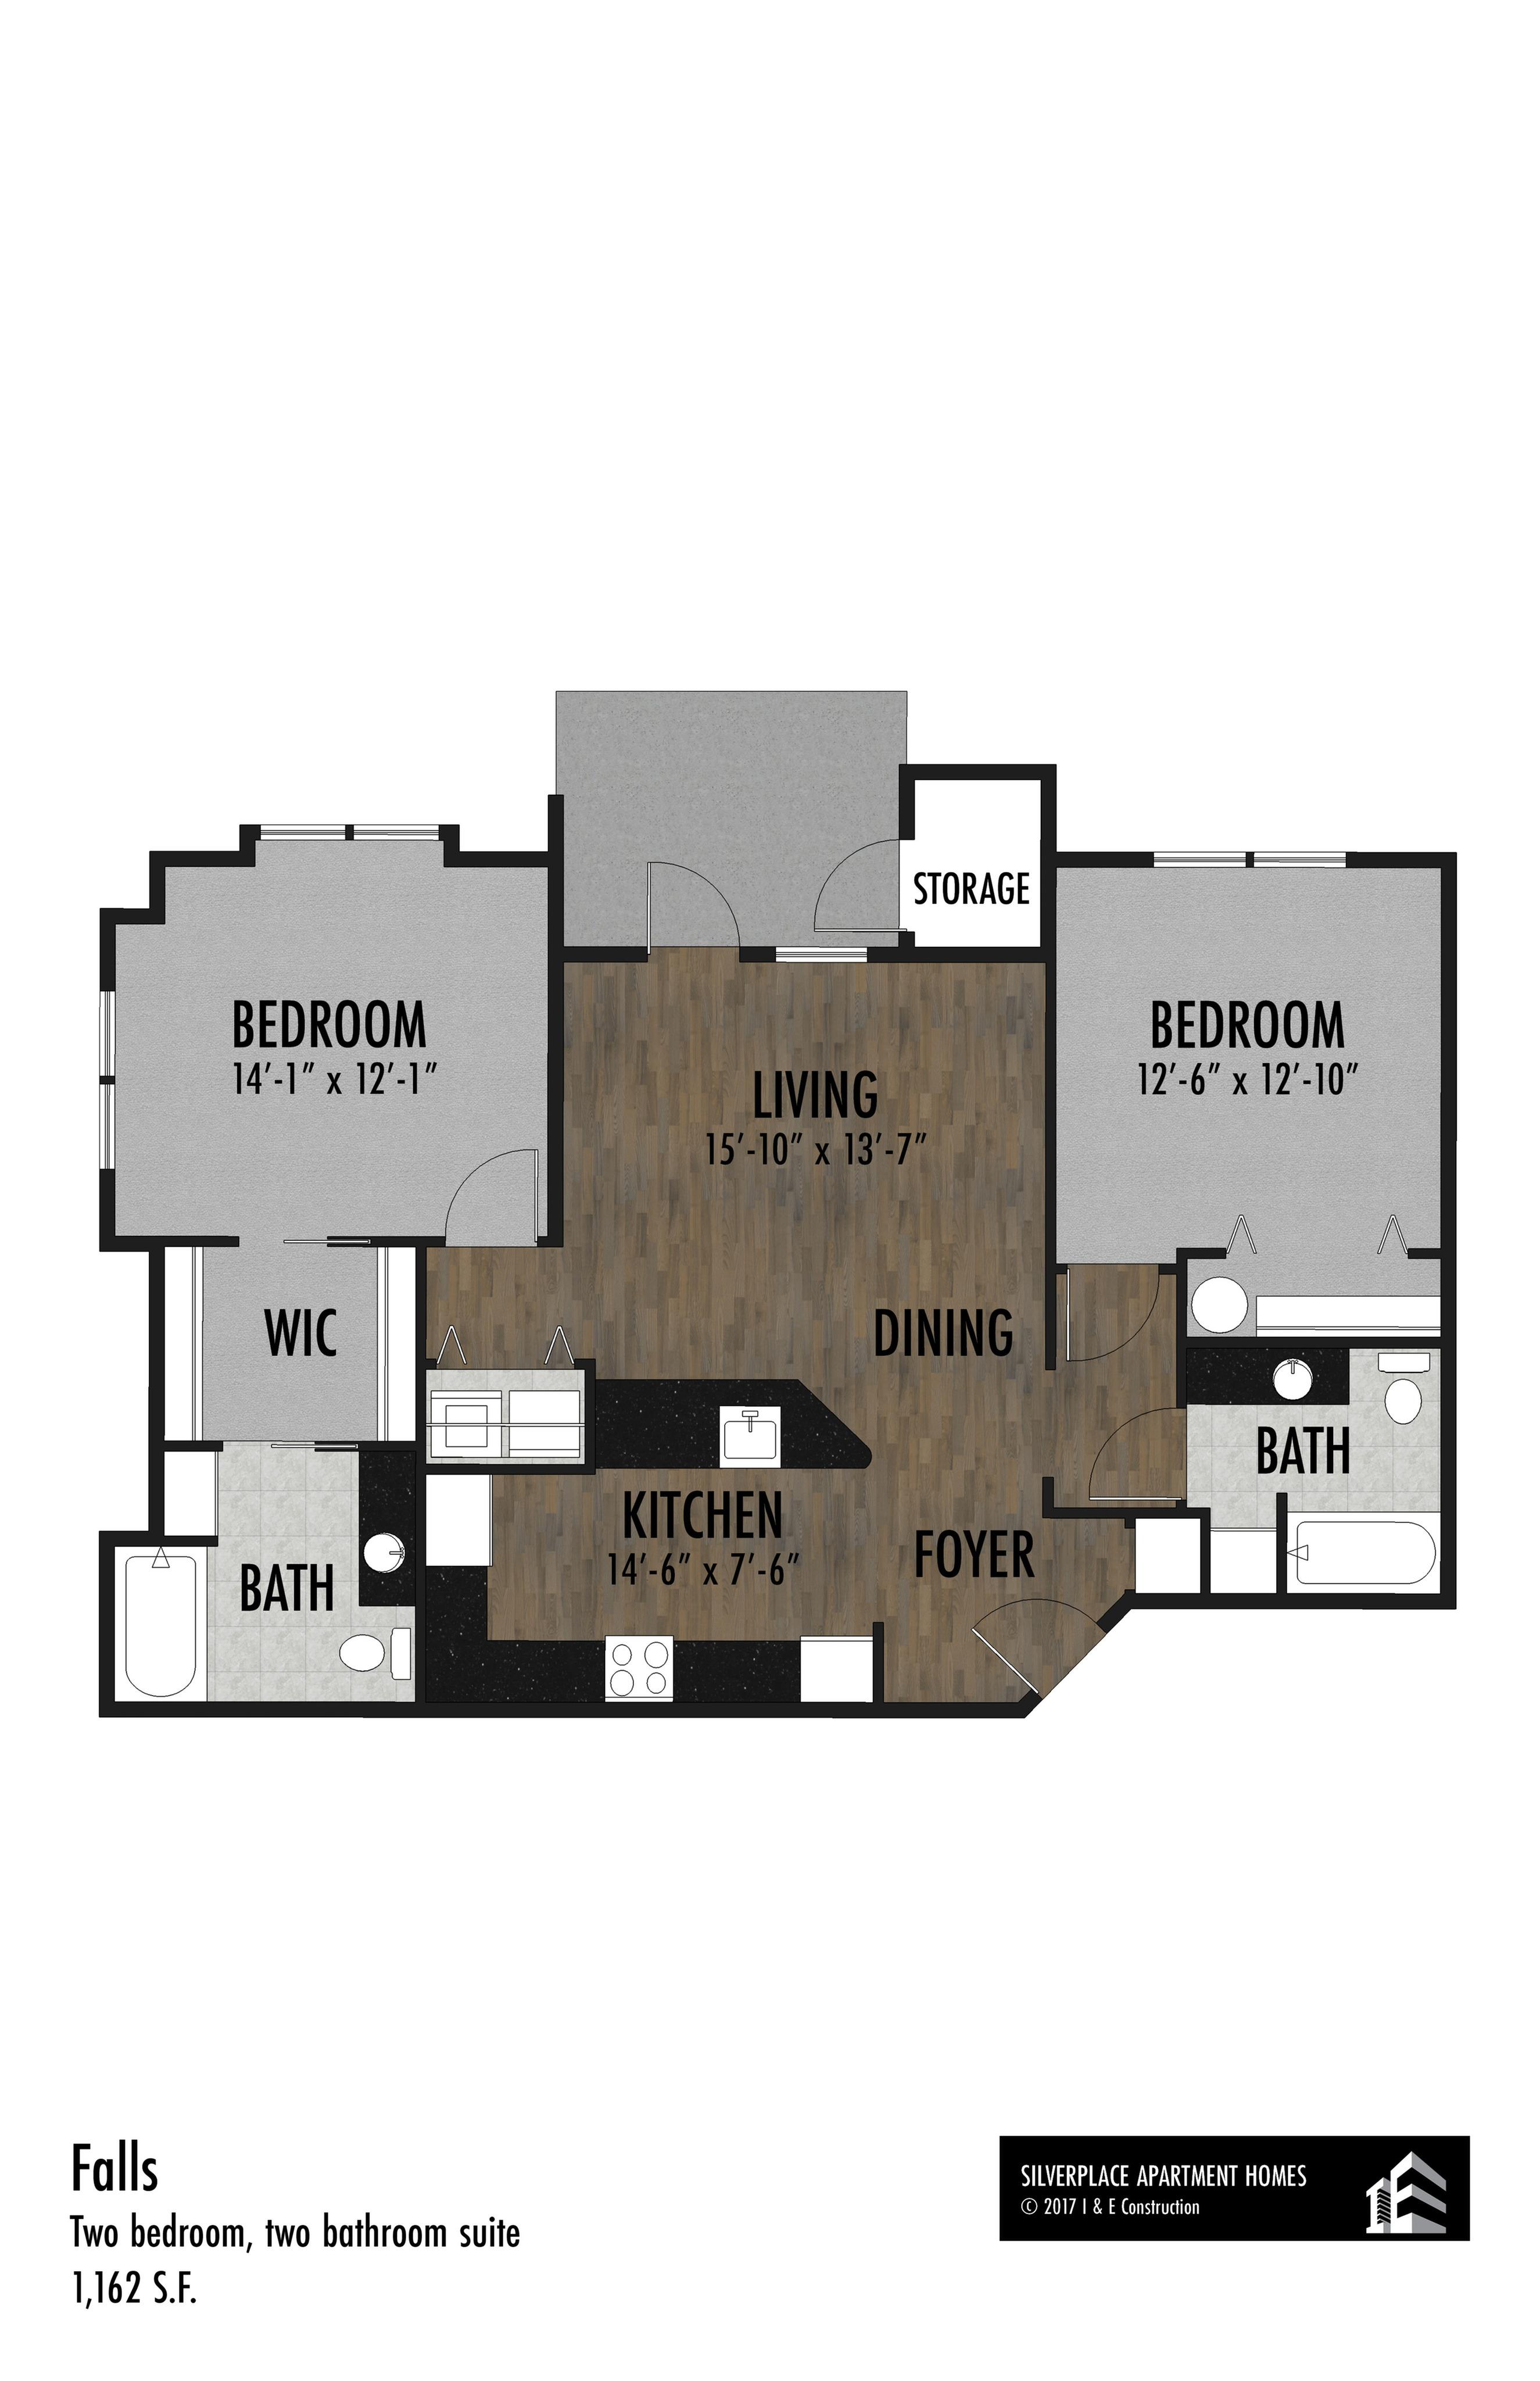 Falls Suite - 2 Bed 2 Bath